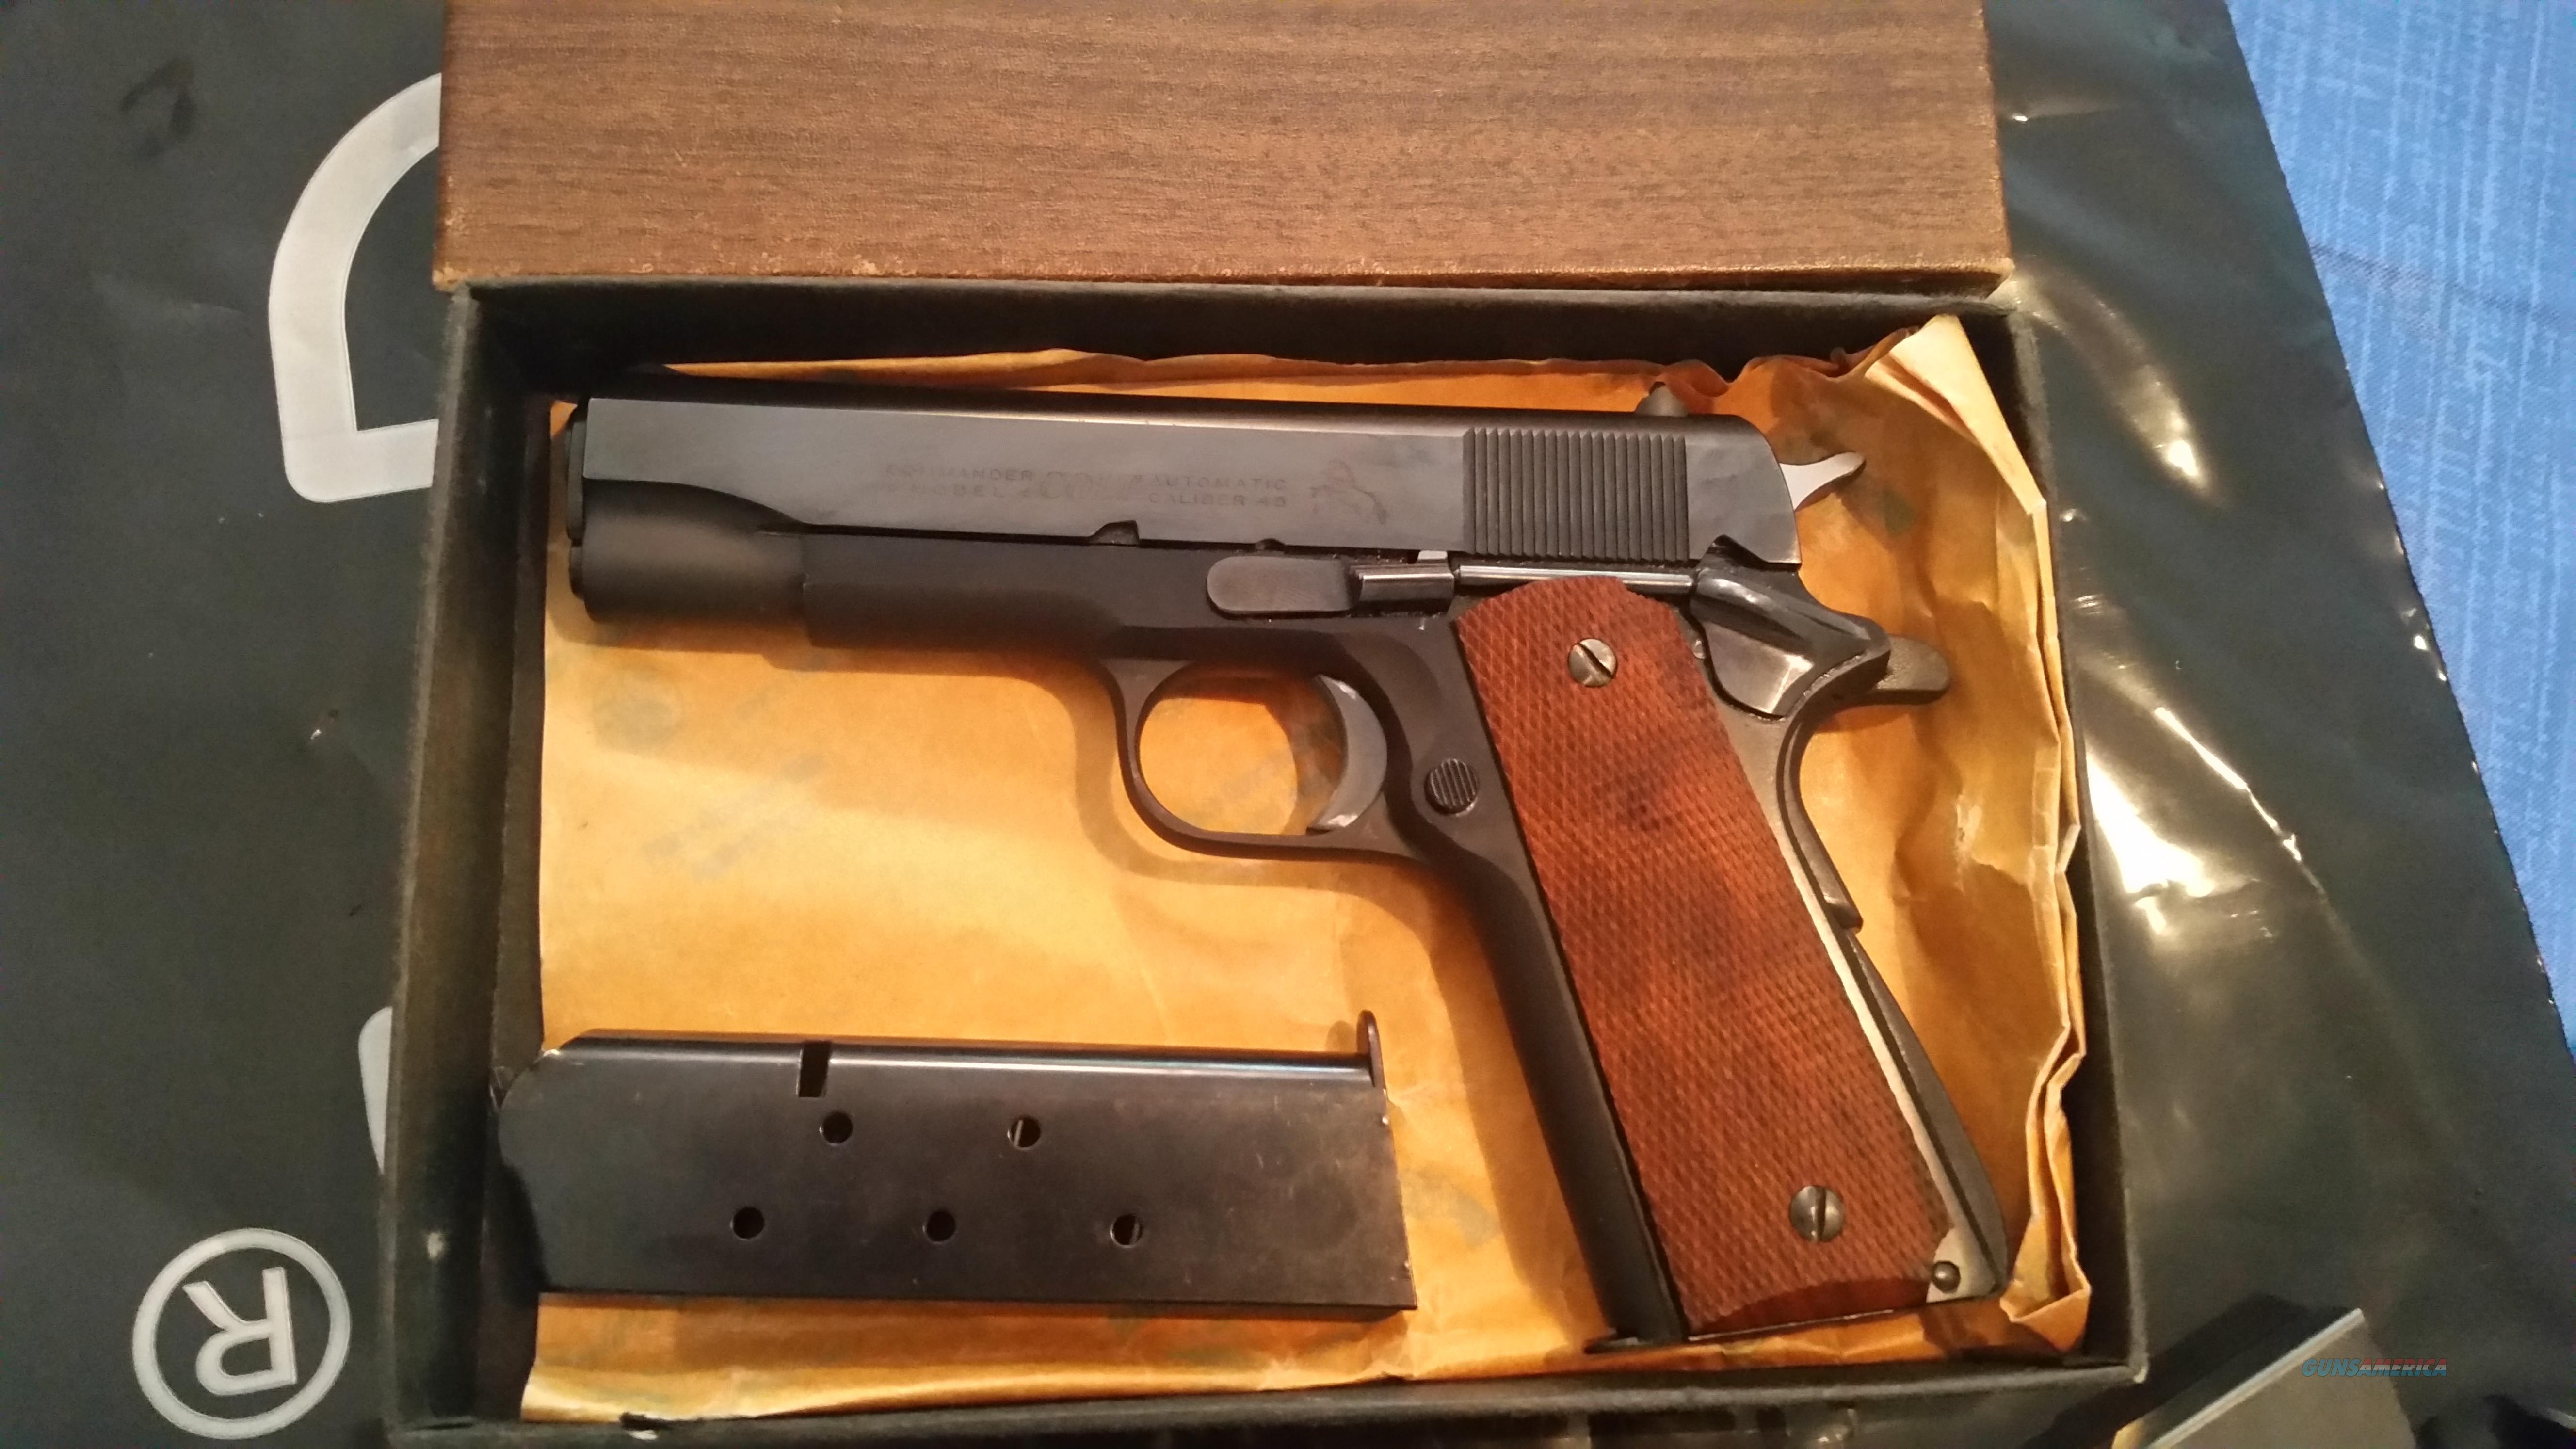 Colt Combat Commander LW - 1970s  Guns > Pistols > Colt Automatic Pistols (1911 & Var)